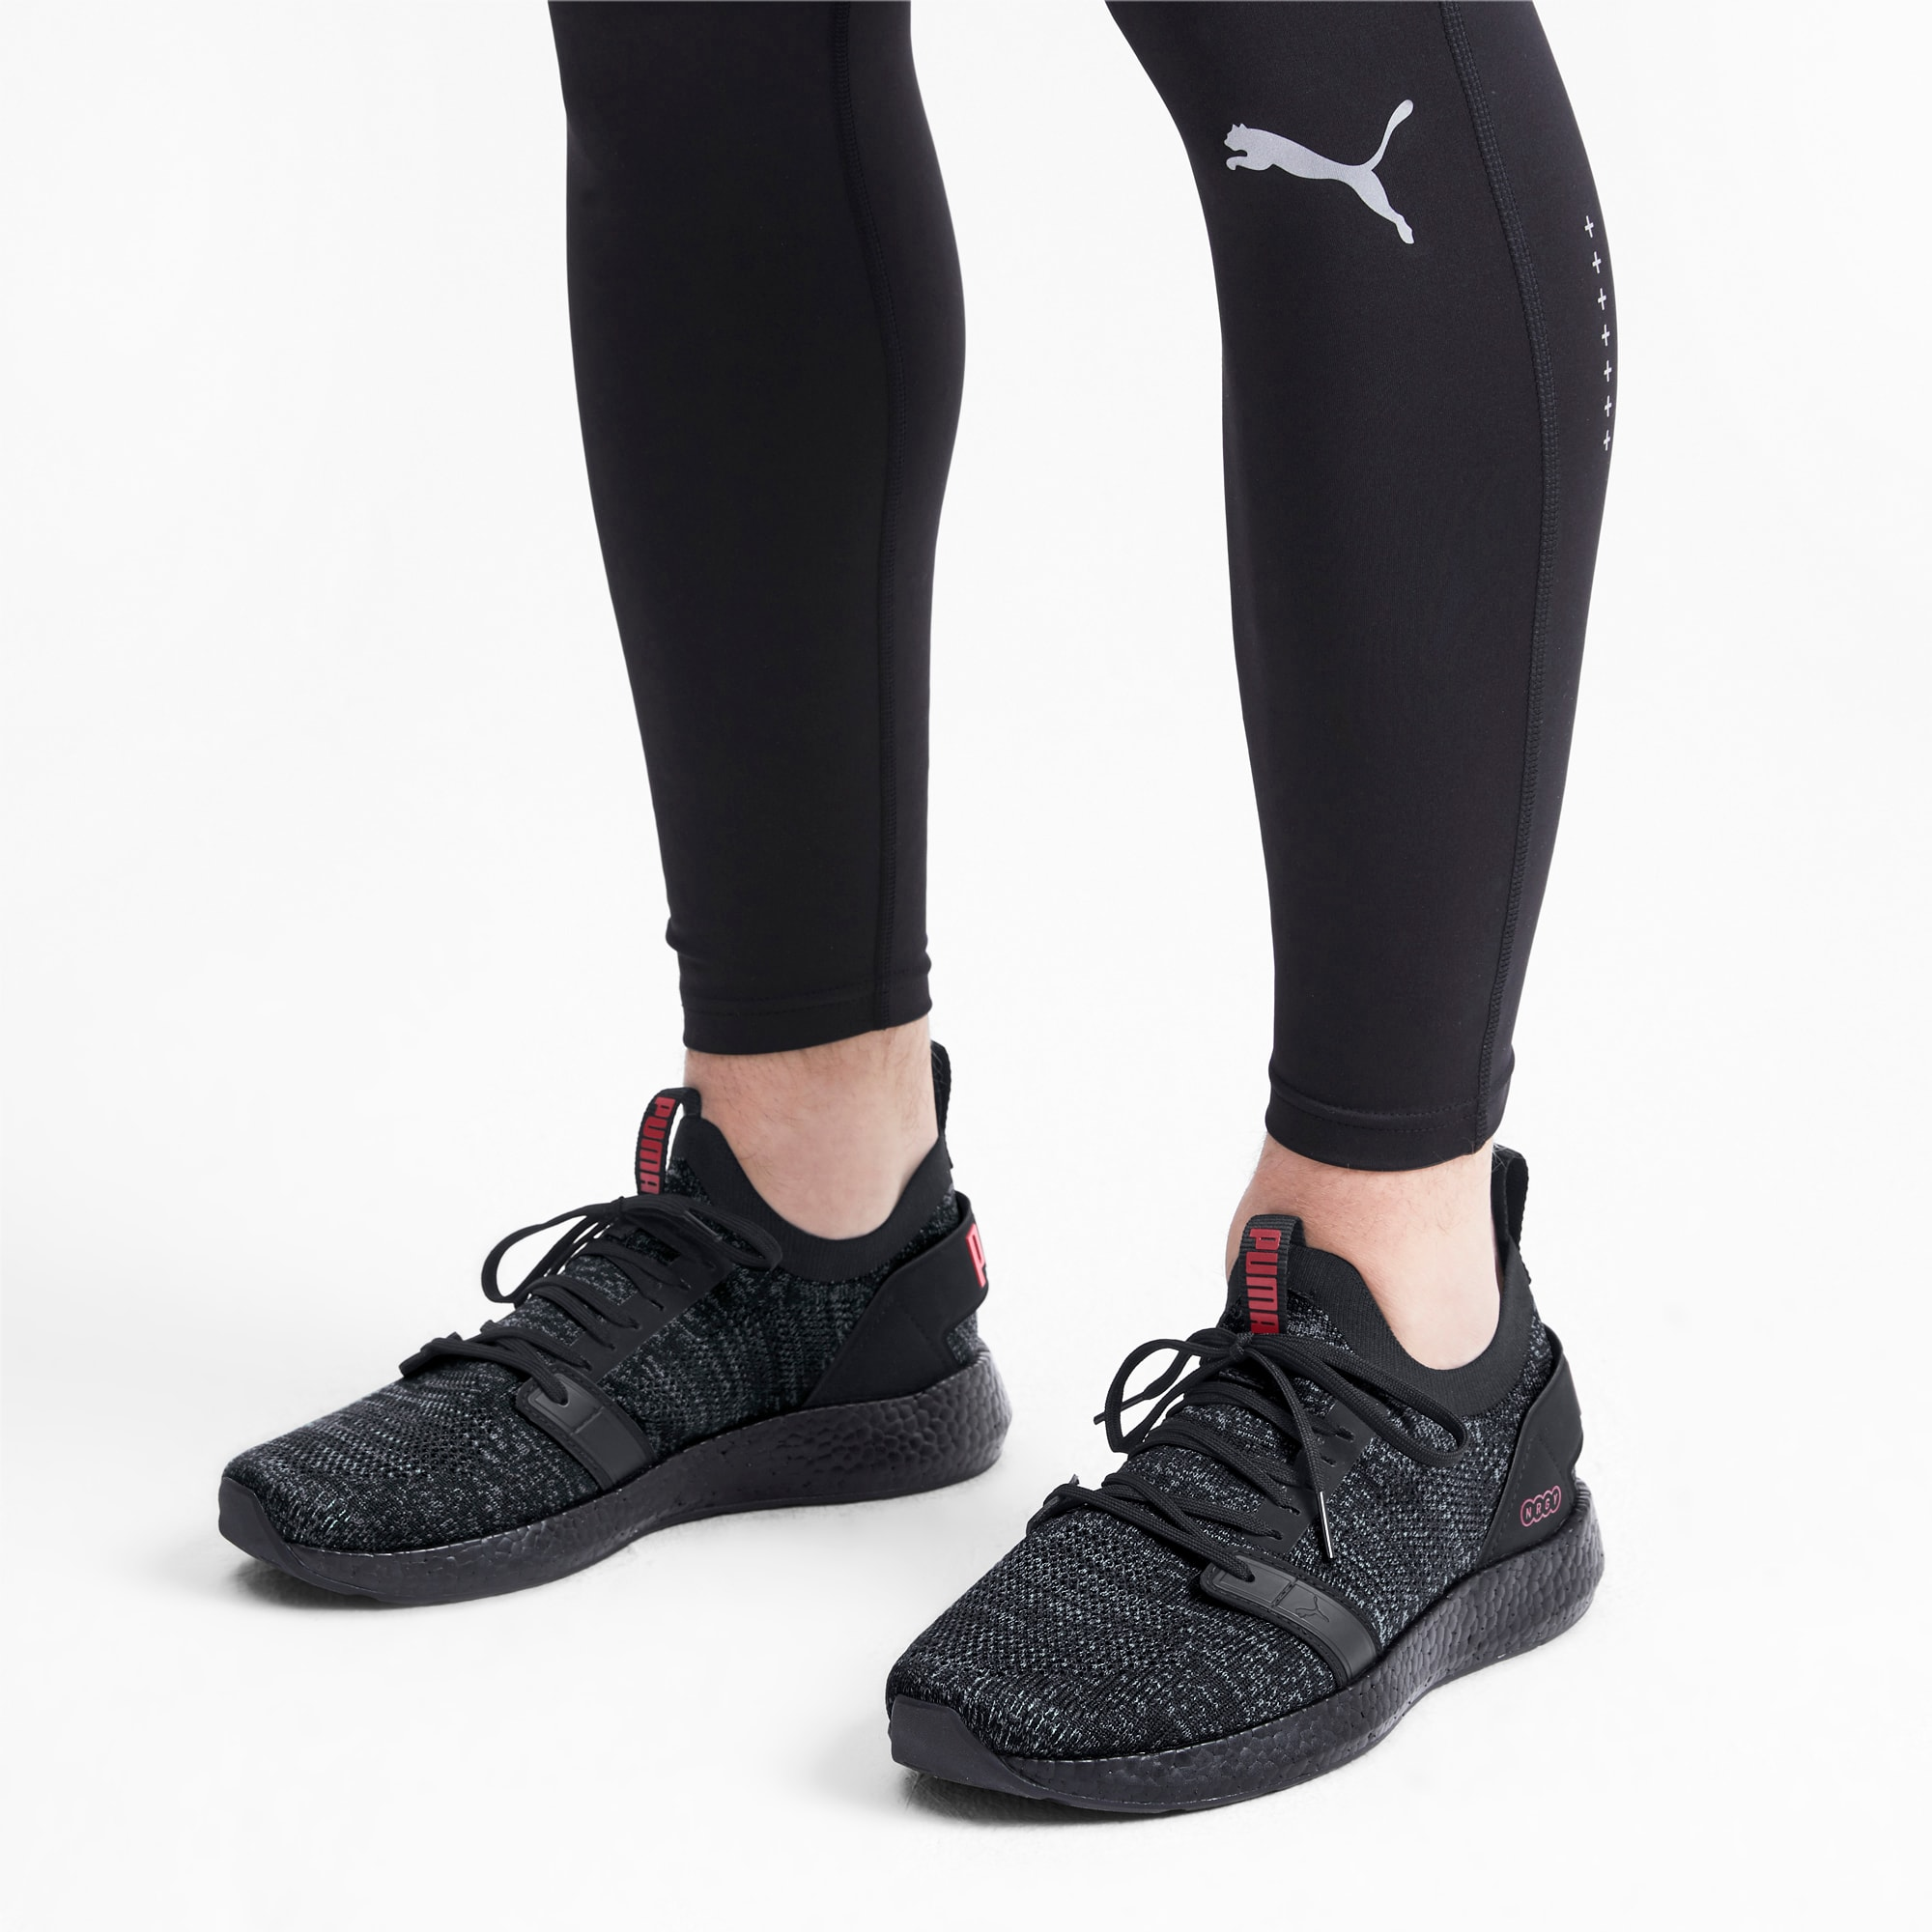 NRGY NEKO ENGINEER KNIT Men's Running Shoes | 21 | PUMA Running | PUMA